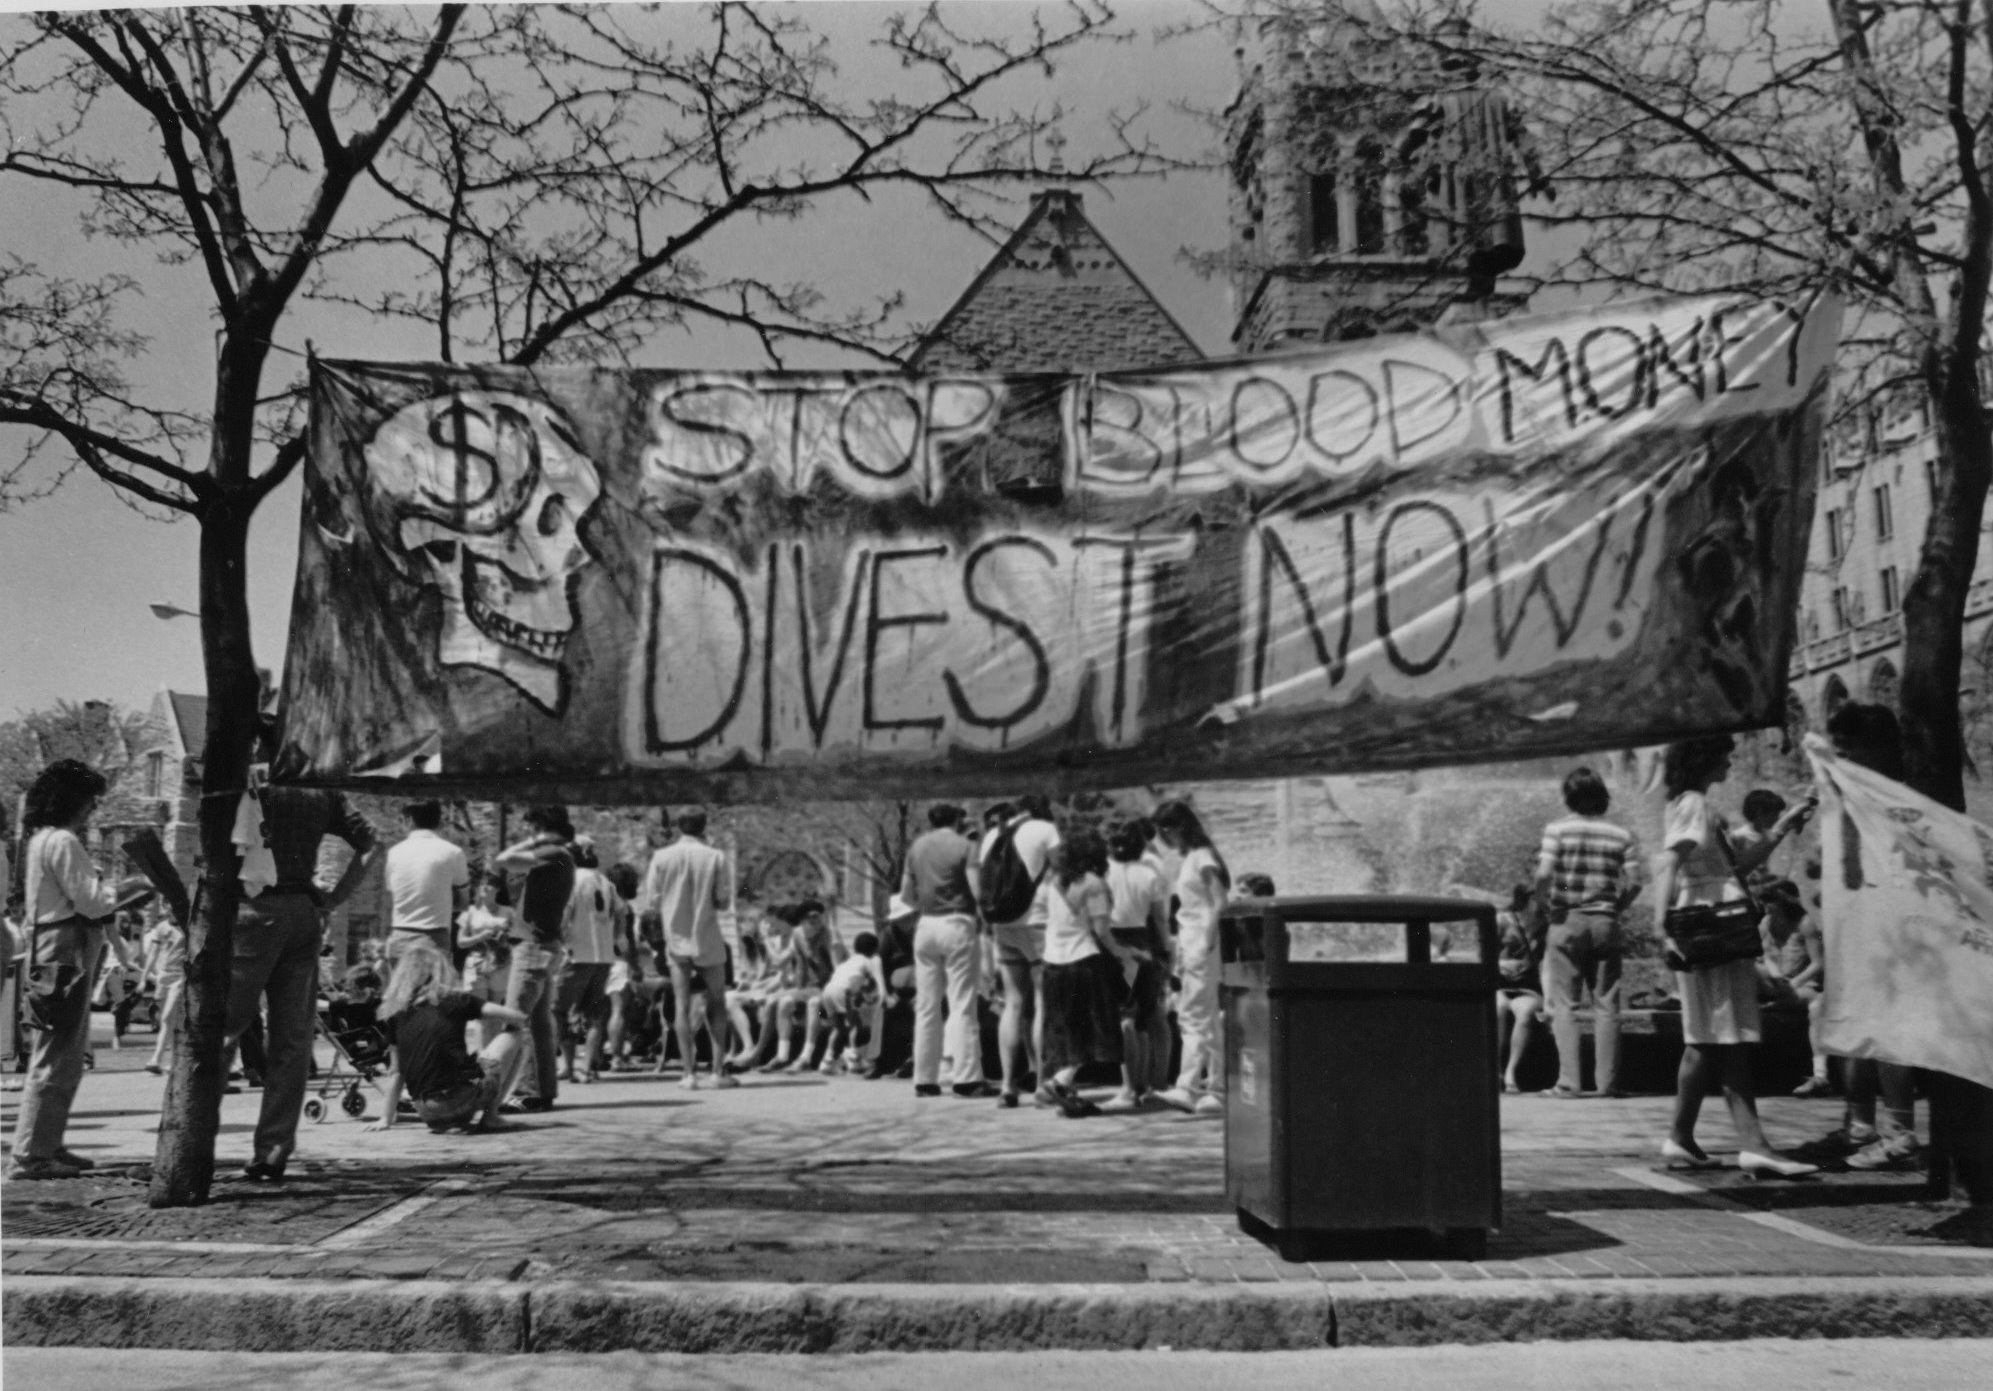 south-africa-divestment-sanctions-boycott-apartheid-nelson-mandela-anc-free-south-africa-movement